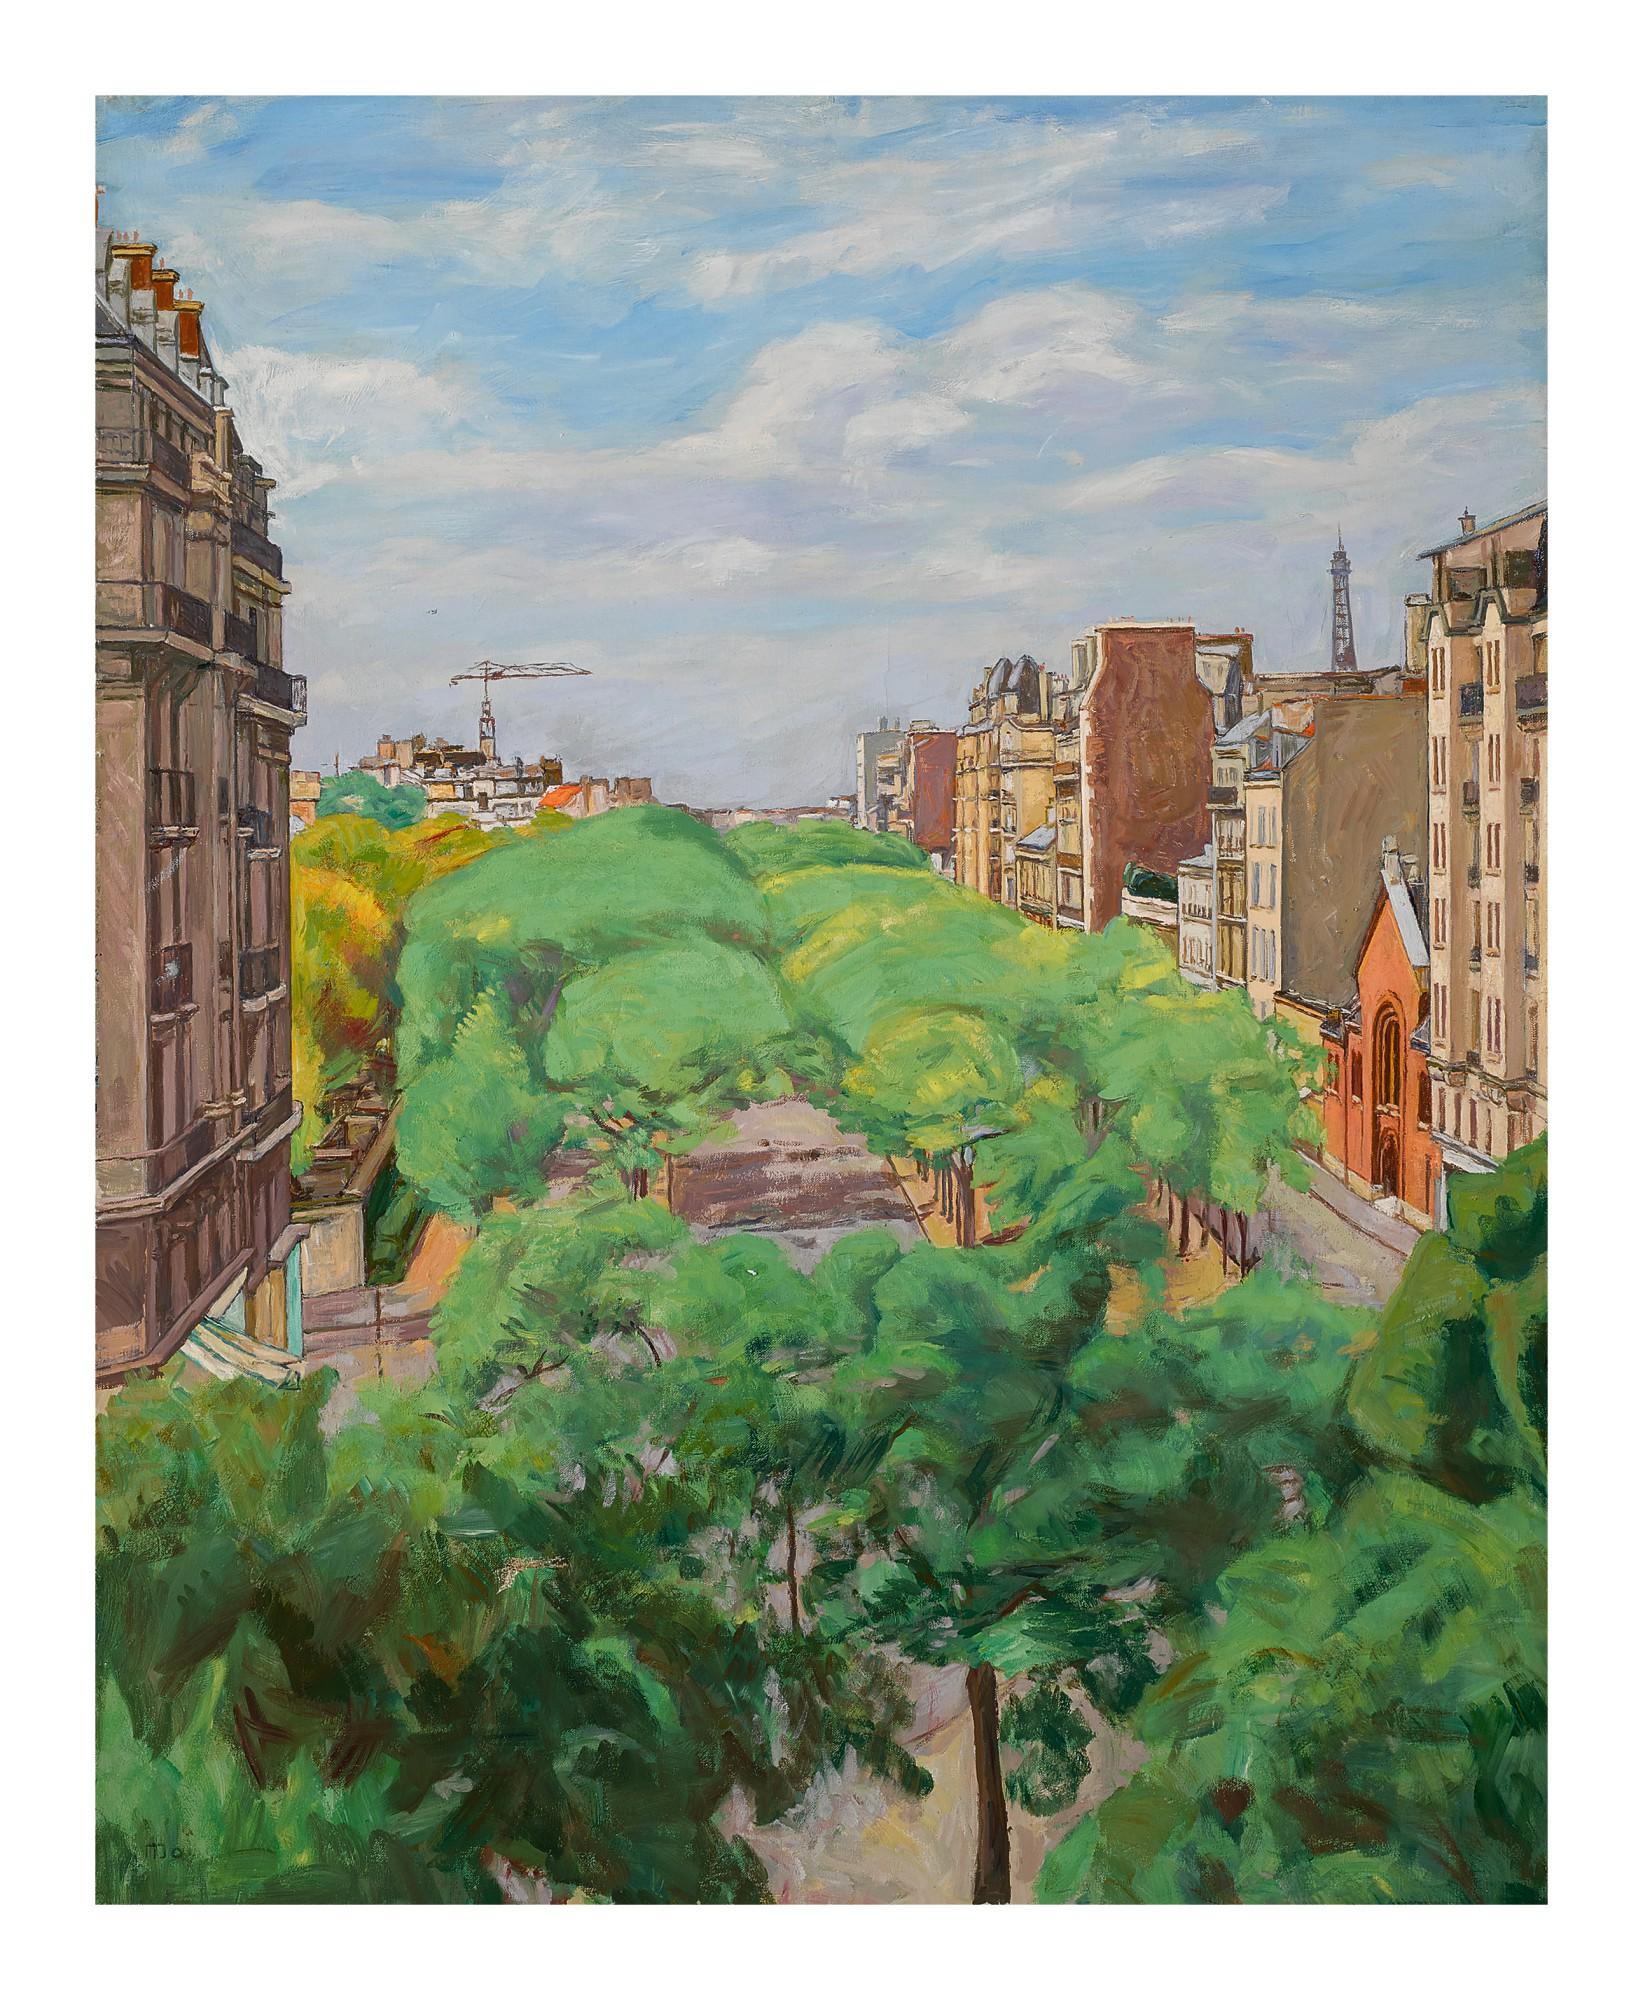 SIMON MONDZAIN | BOULEVARD EDGAR QUINET, PARIS (XIVE)